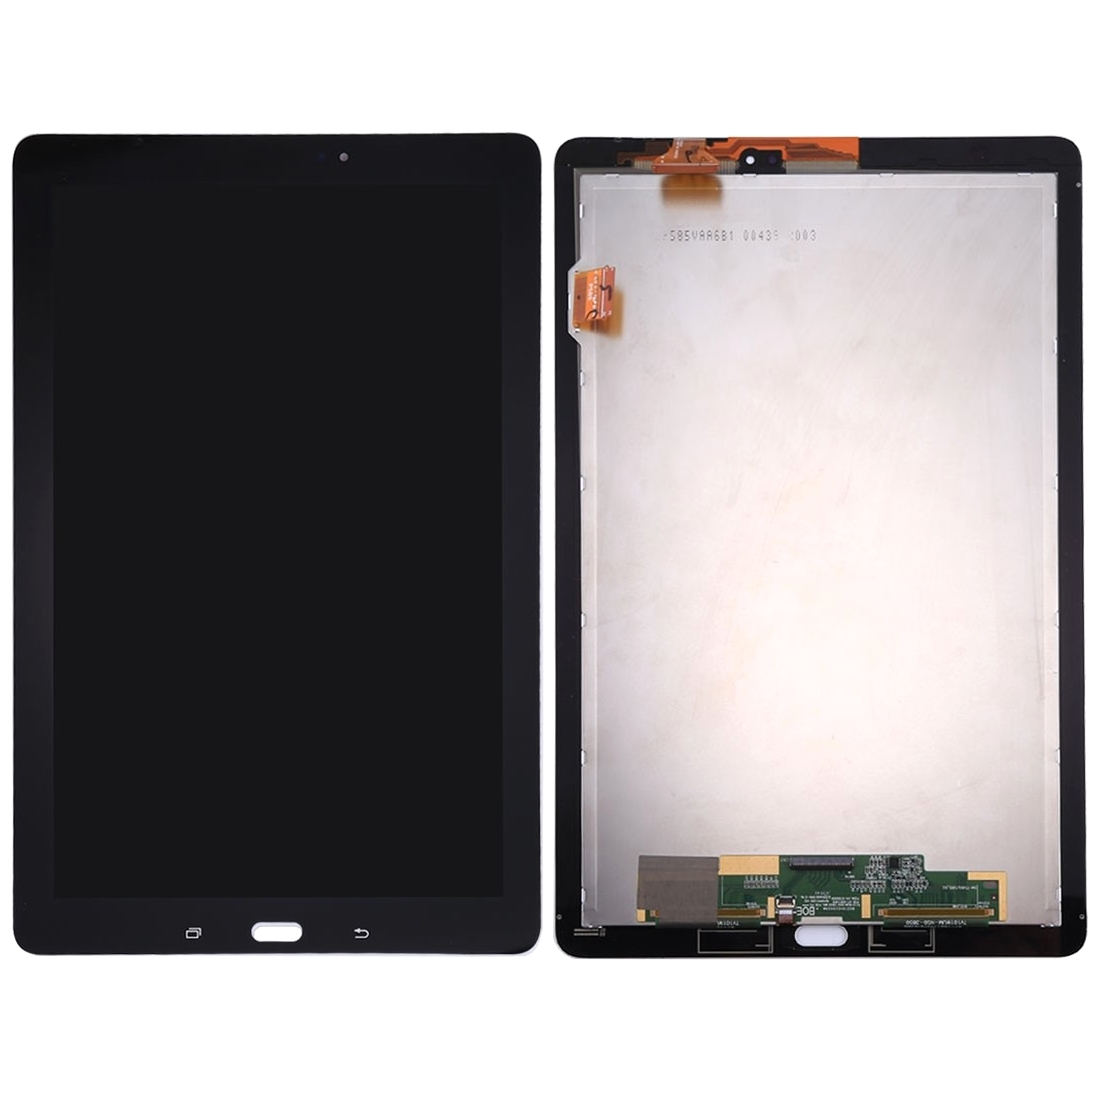 Ansamblu LCD Display Touchscreen Samsung Galaxy Tab A 10.1 2016 S Pen P585 Negru imagine powerlaptop.ro 2021